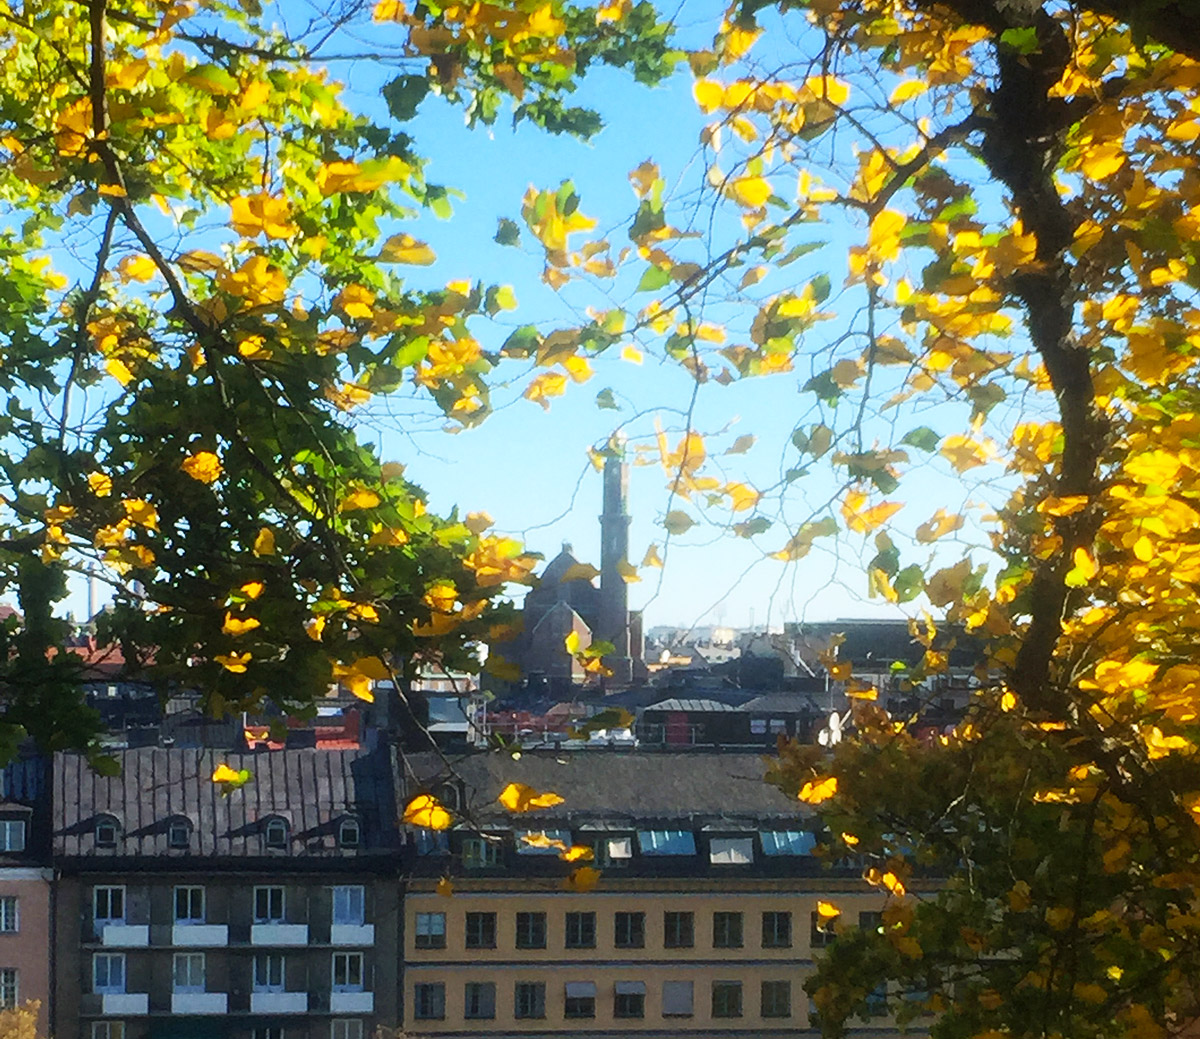 Stockholm skyline and autumn trees